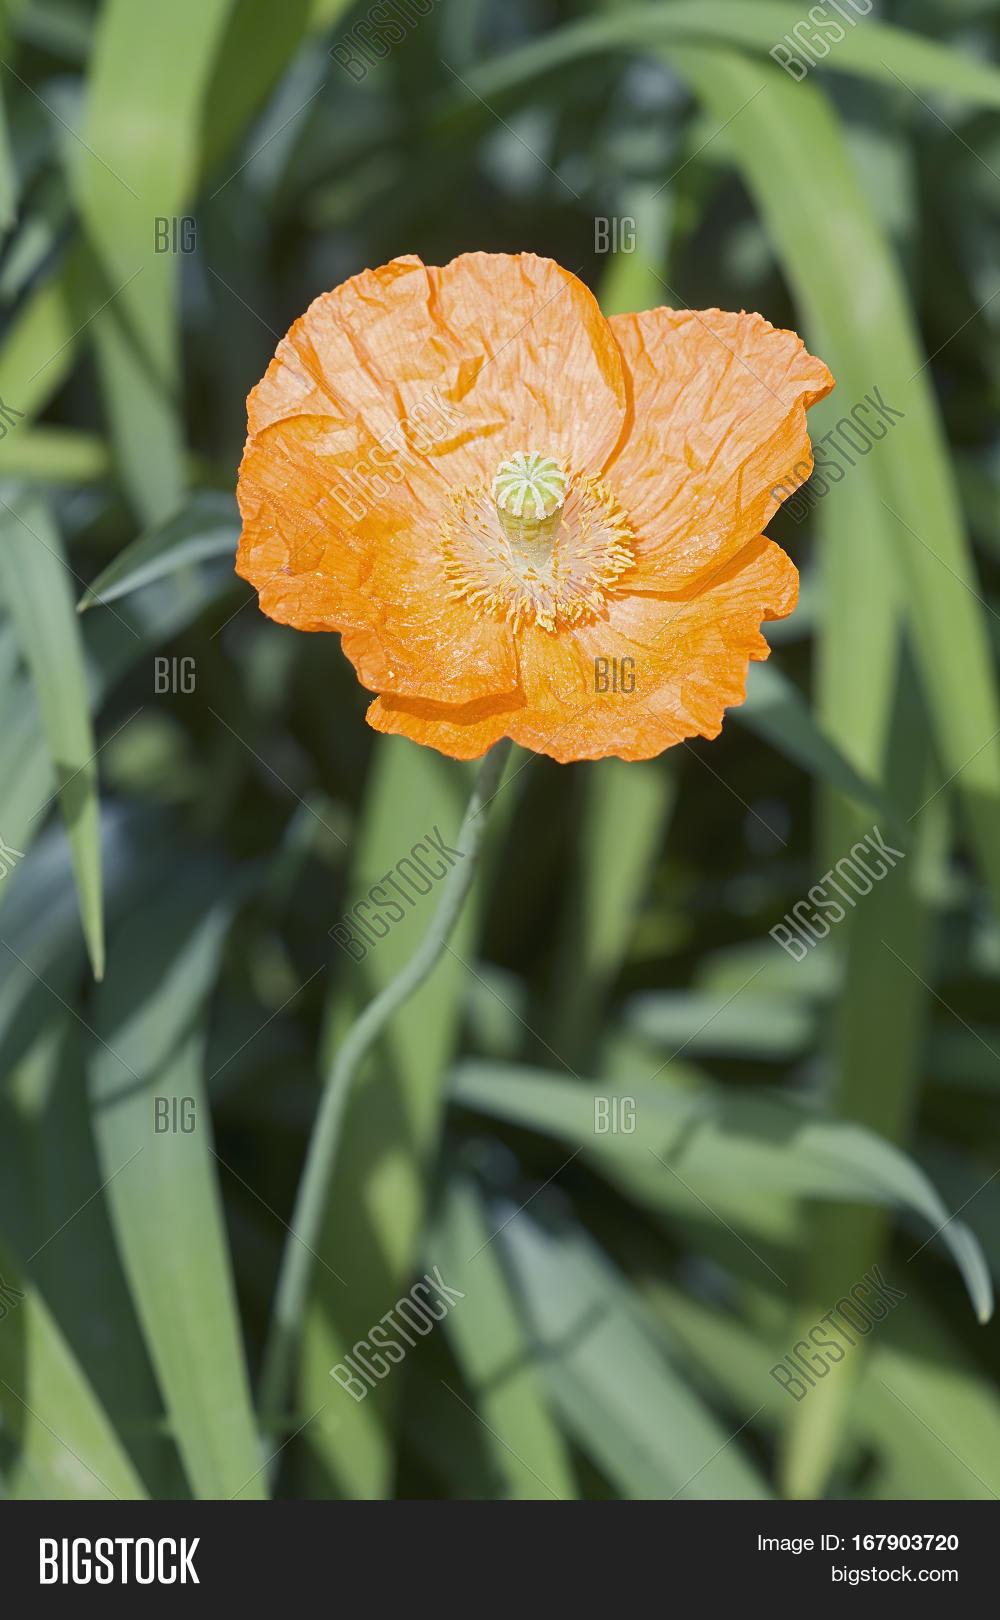 Iceland poppy flower image photo free trial bigstock iceland poppy flower mightylinksfo